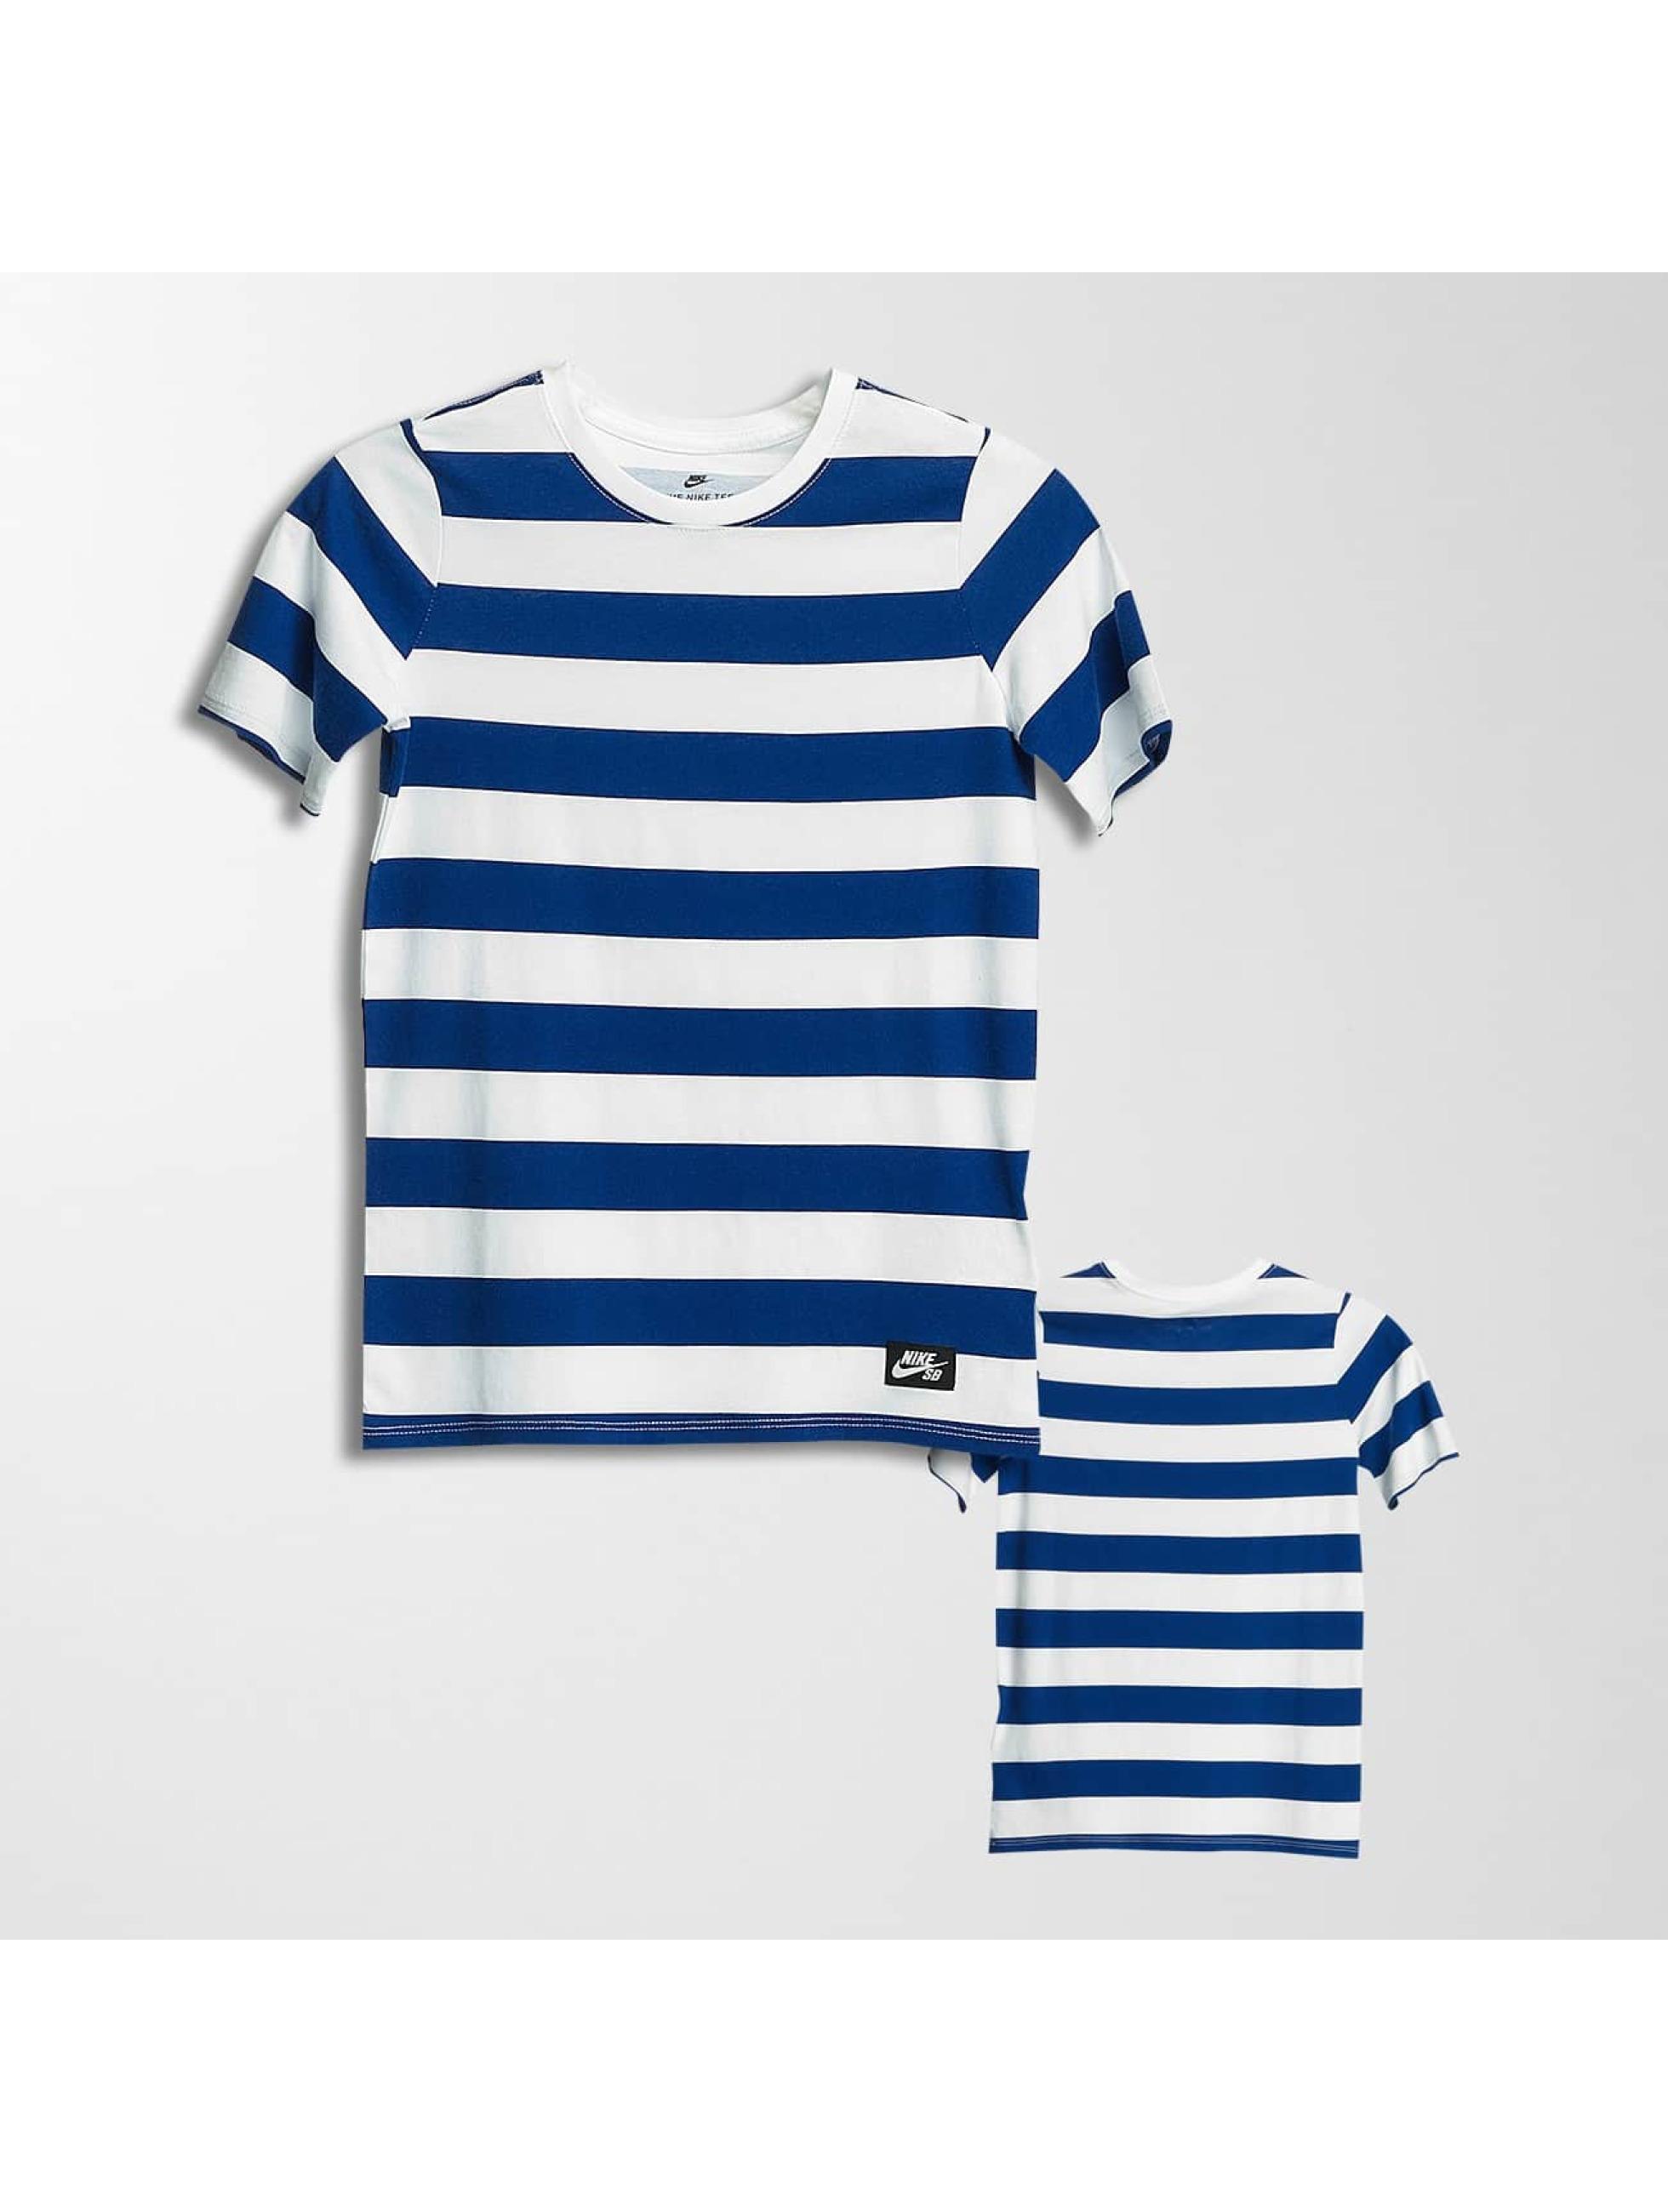 Nike SB T-Shirt Boys white